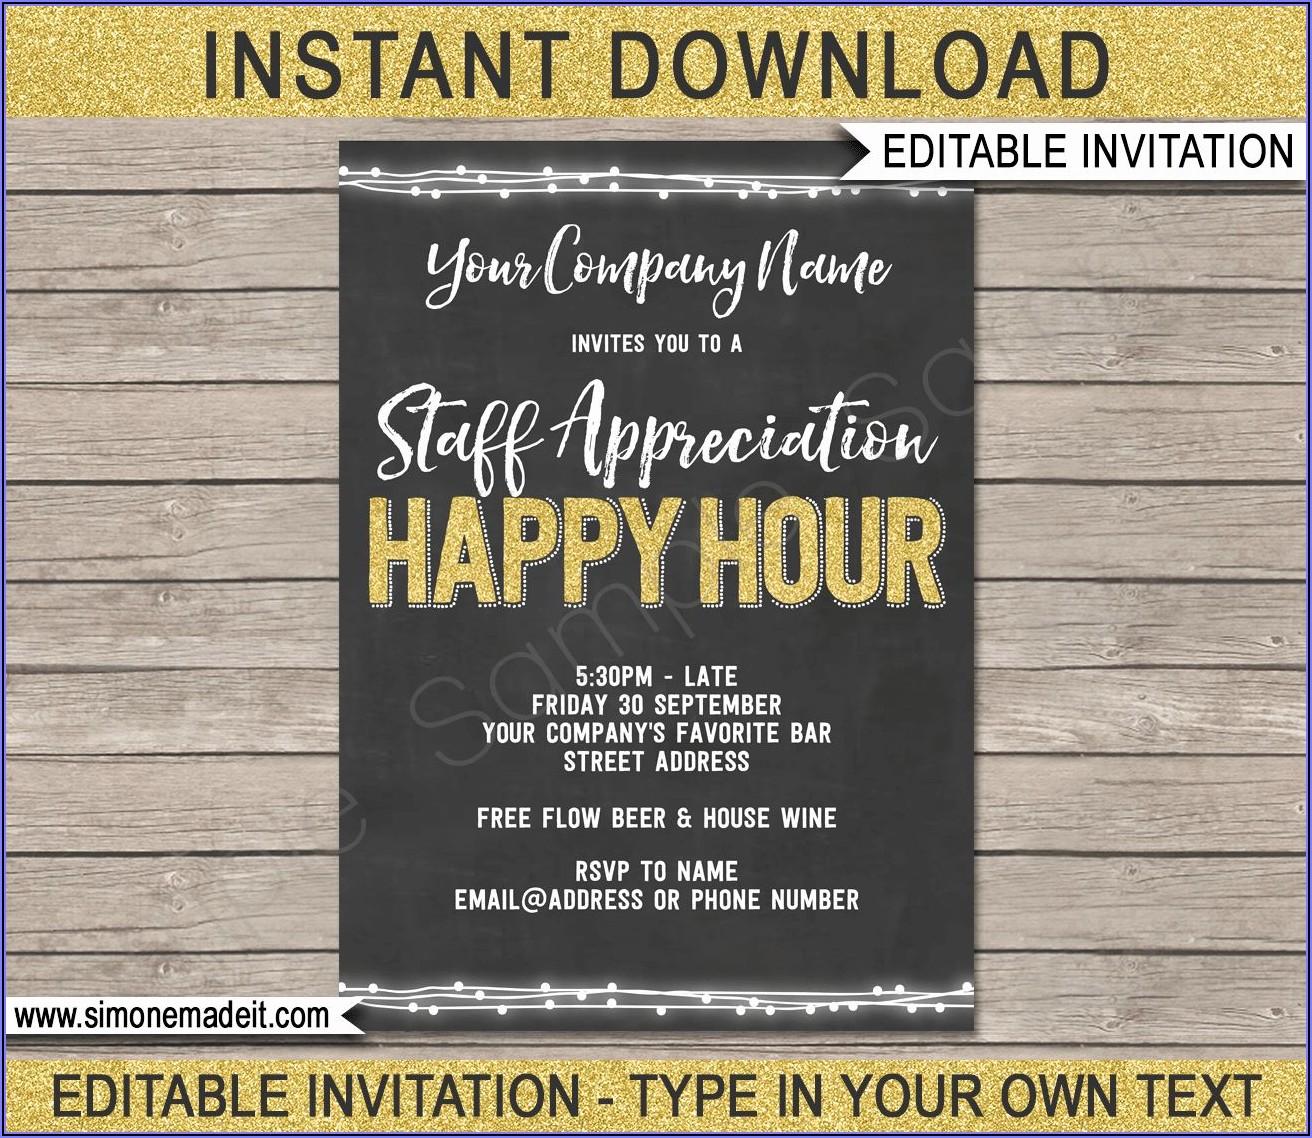 Happy Hour Invite Template Free